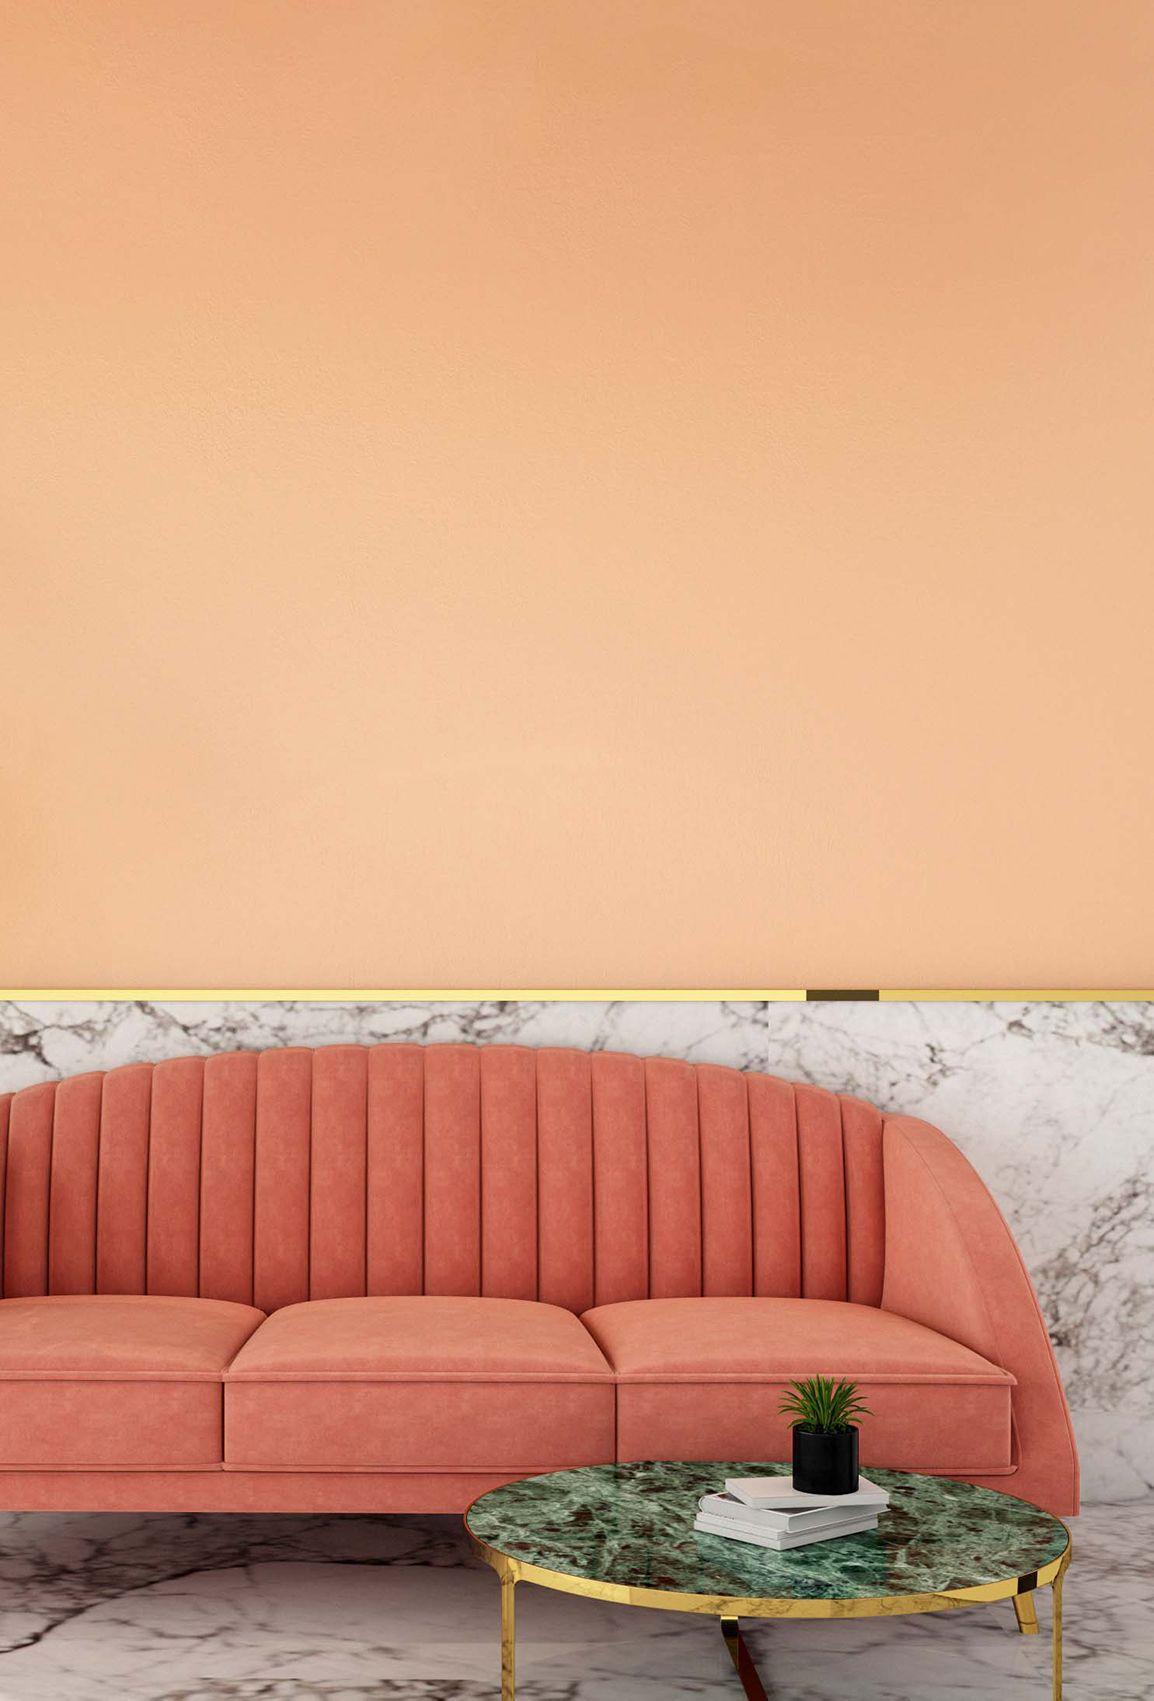 Sorbet C2 528 Orange Rooms Orange Paint Colors Peach Rooms #peach #living #room #walls